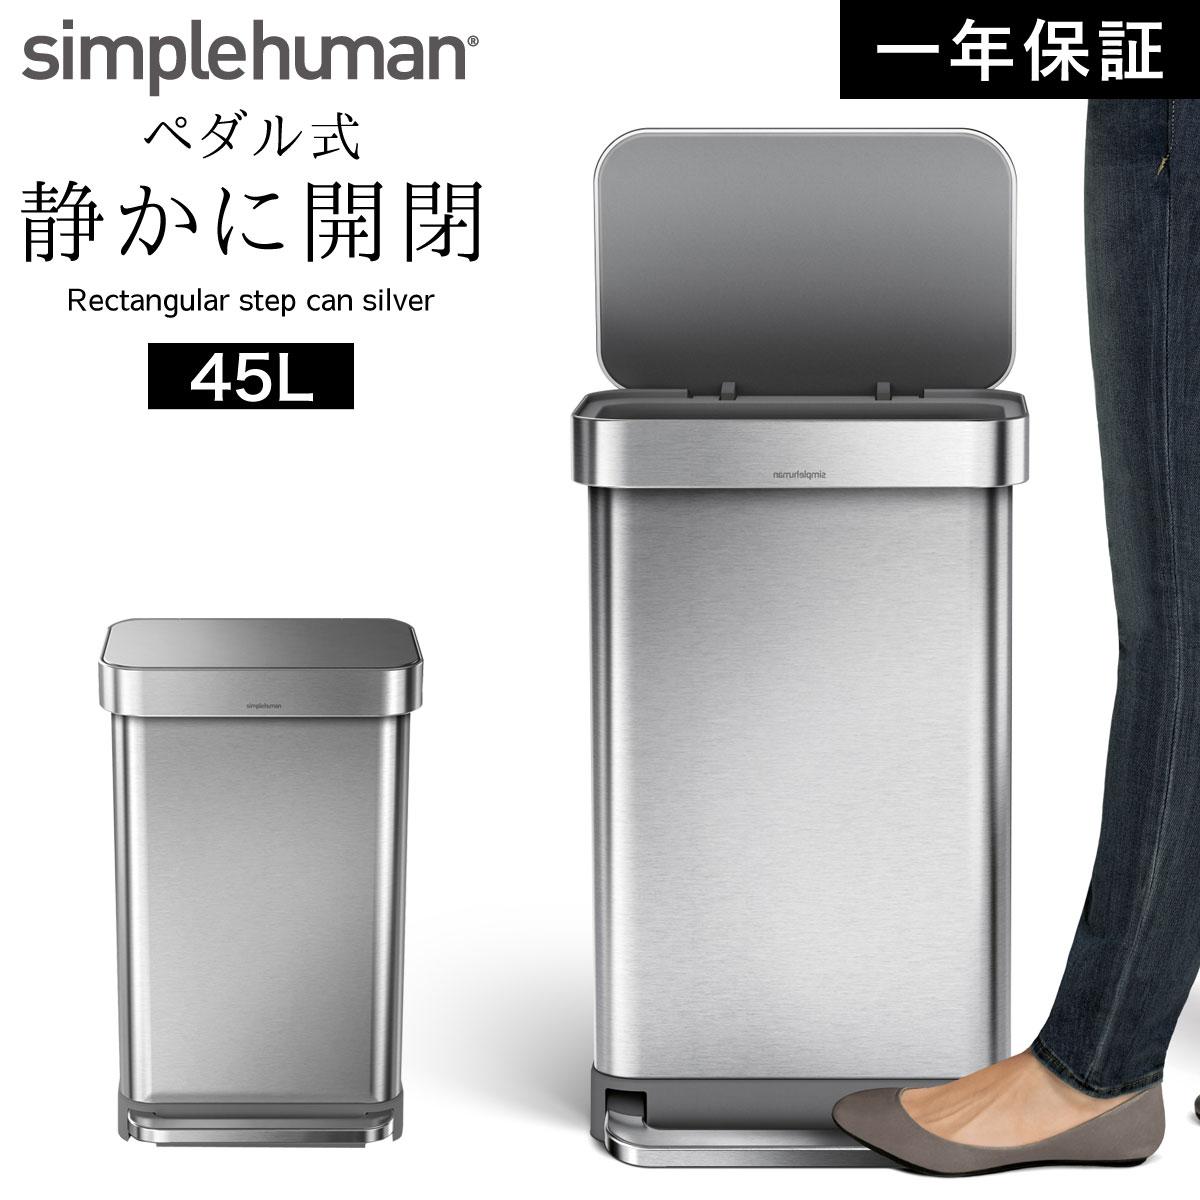 simplehuman シンプルヒューマン レクタンギュラーステップカン シルバー 45L 00113 メーカー直送 返品不可